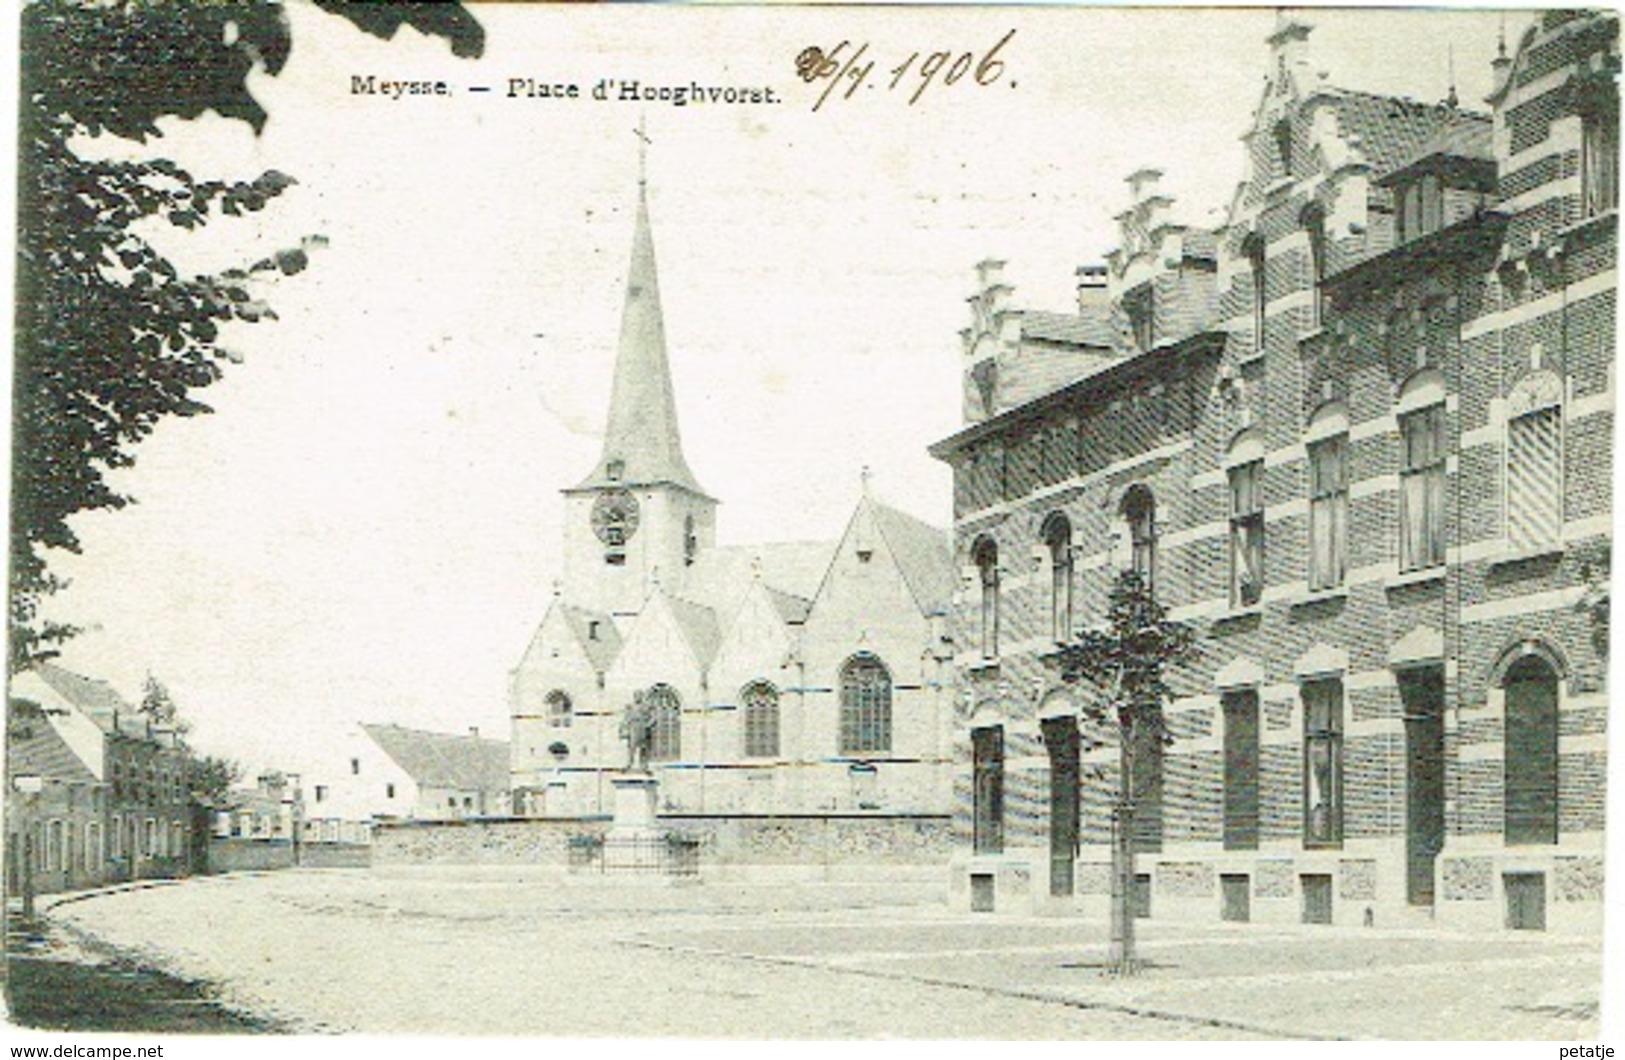 Meysse , Place D'Hoogvorst - Meise